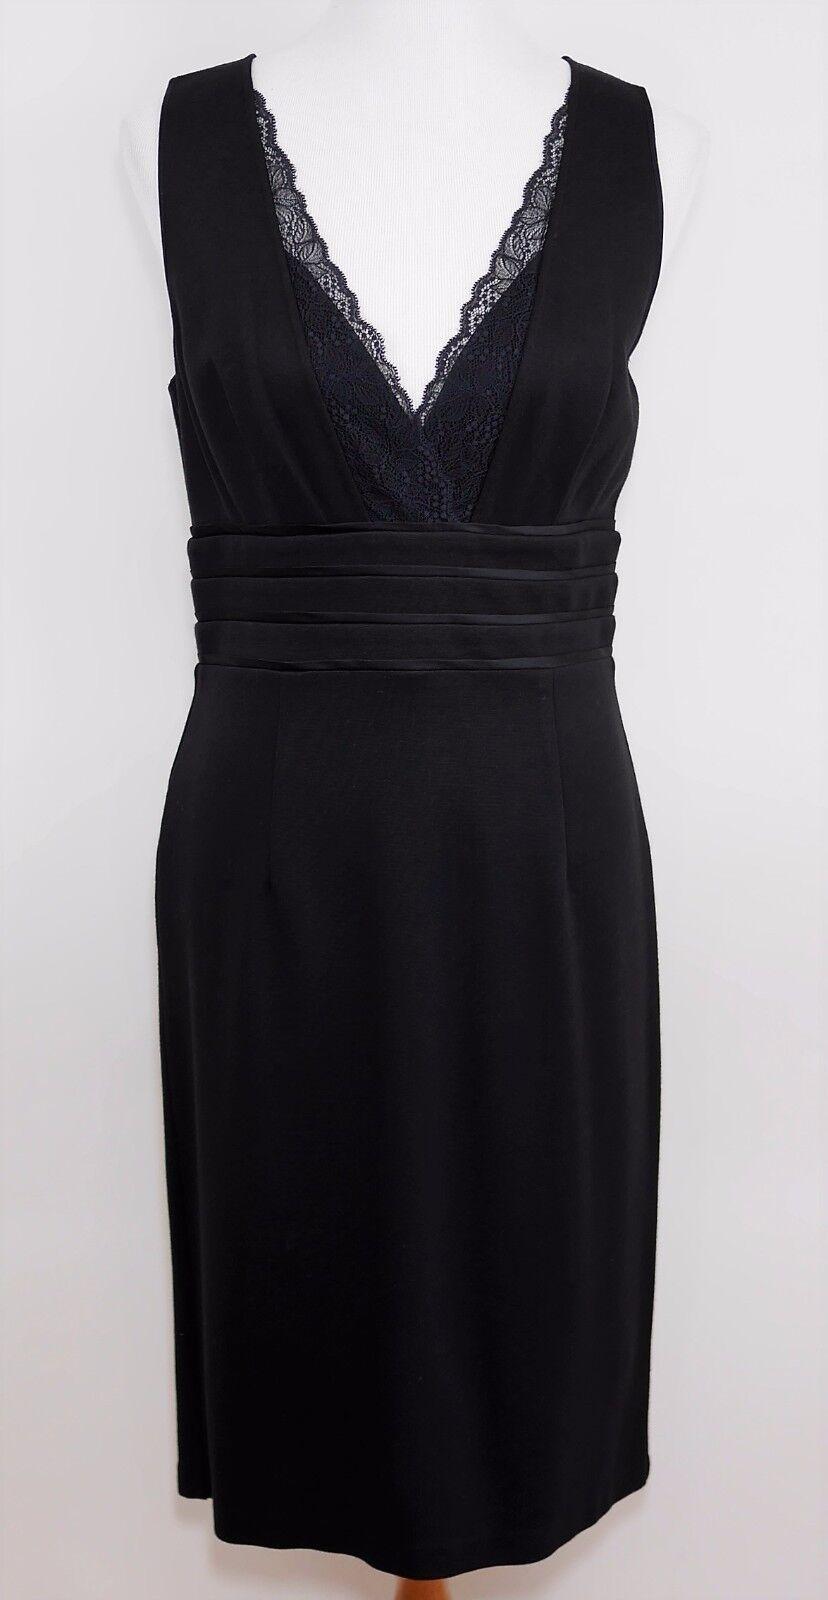 BANANA REPUBLIC schwarz Sleeveless Lace Top Dress Sheath Knee Length - damen 8